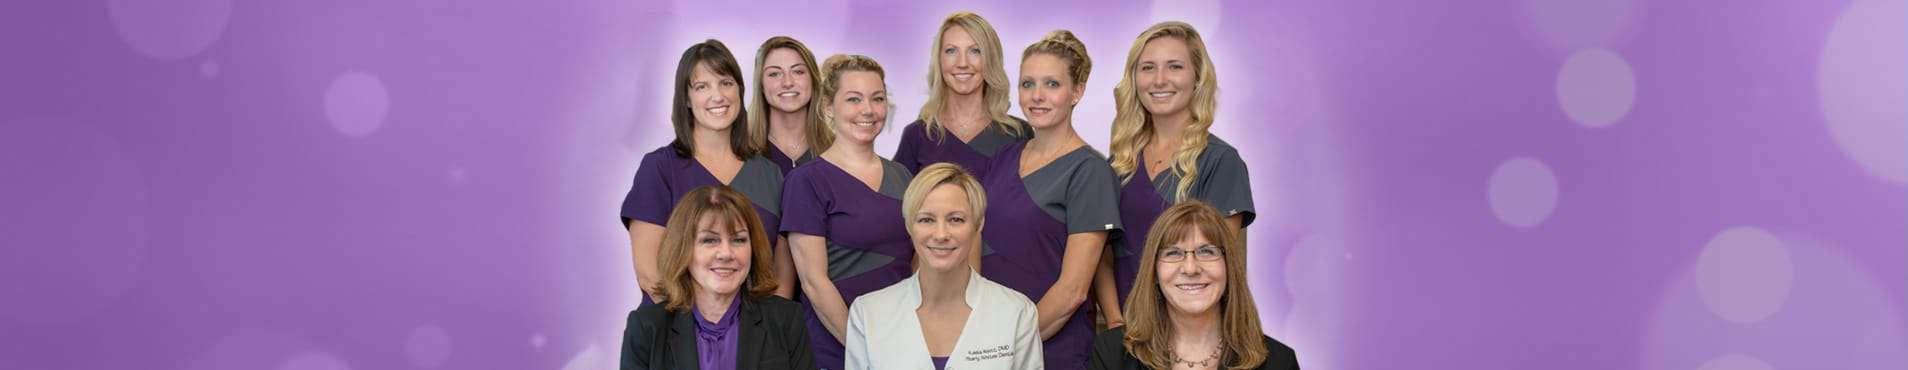 Dental Crowns Dentist Serving Mercer County